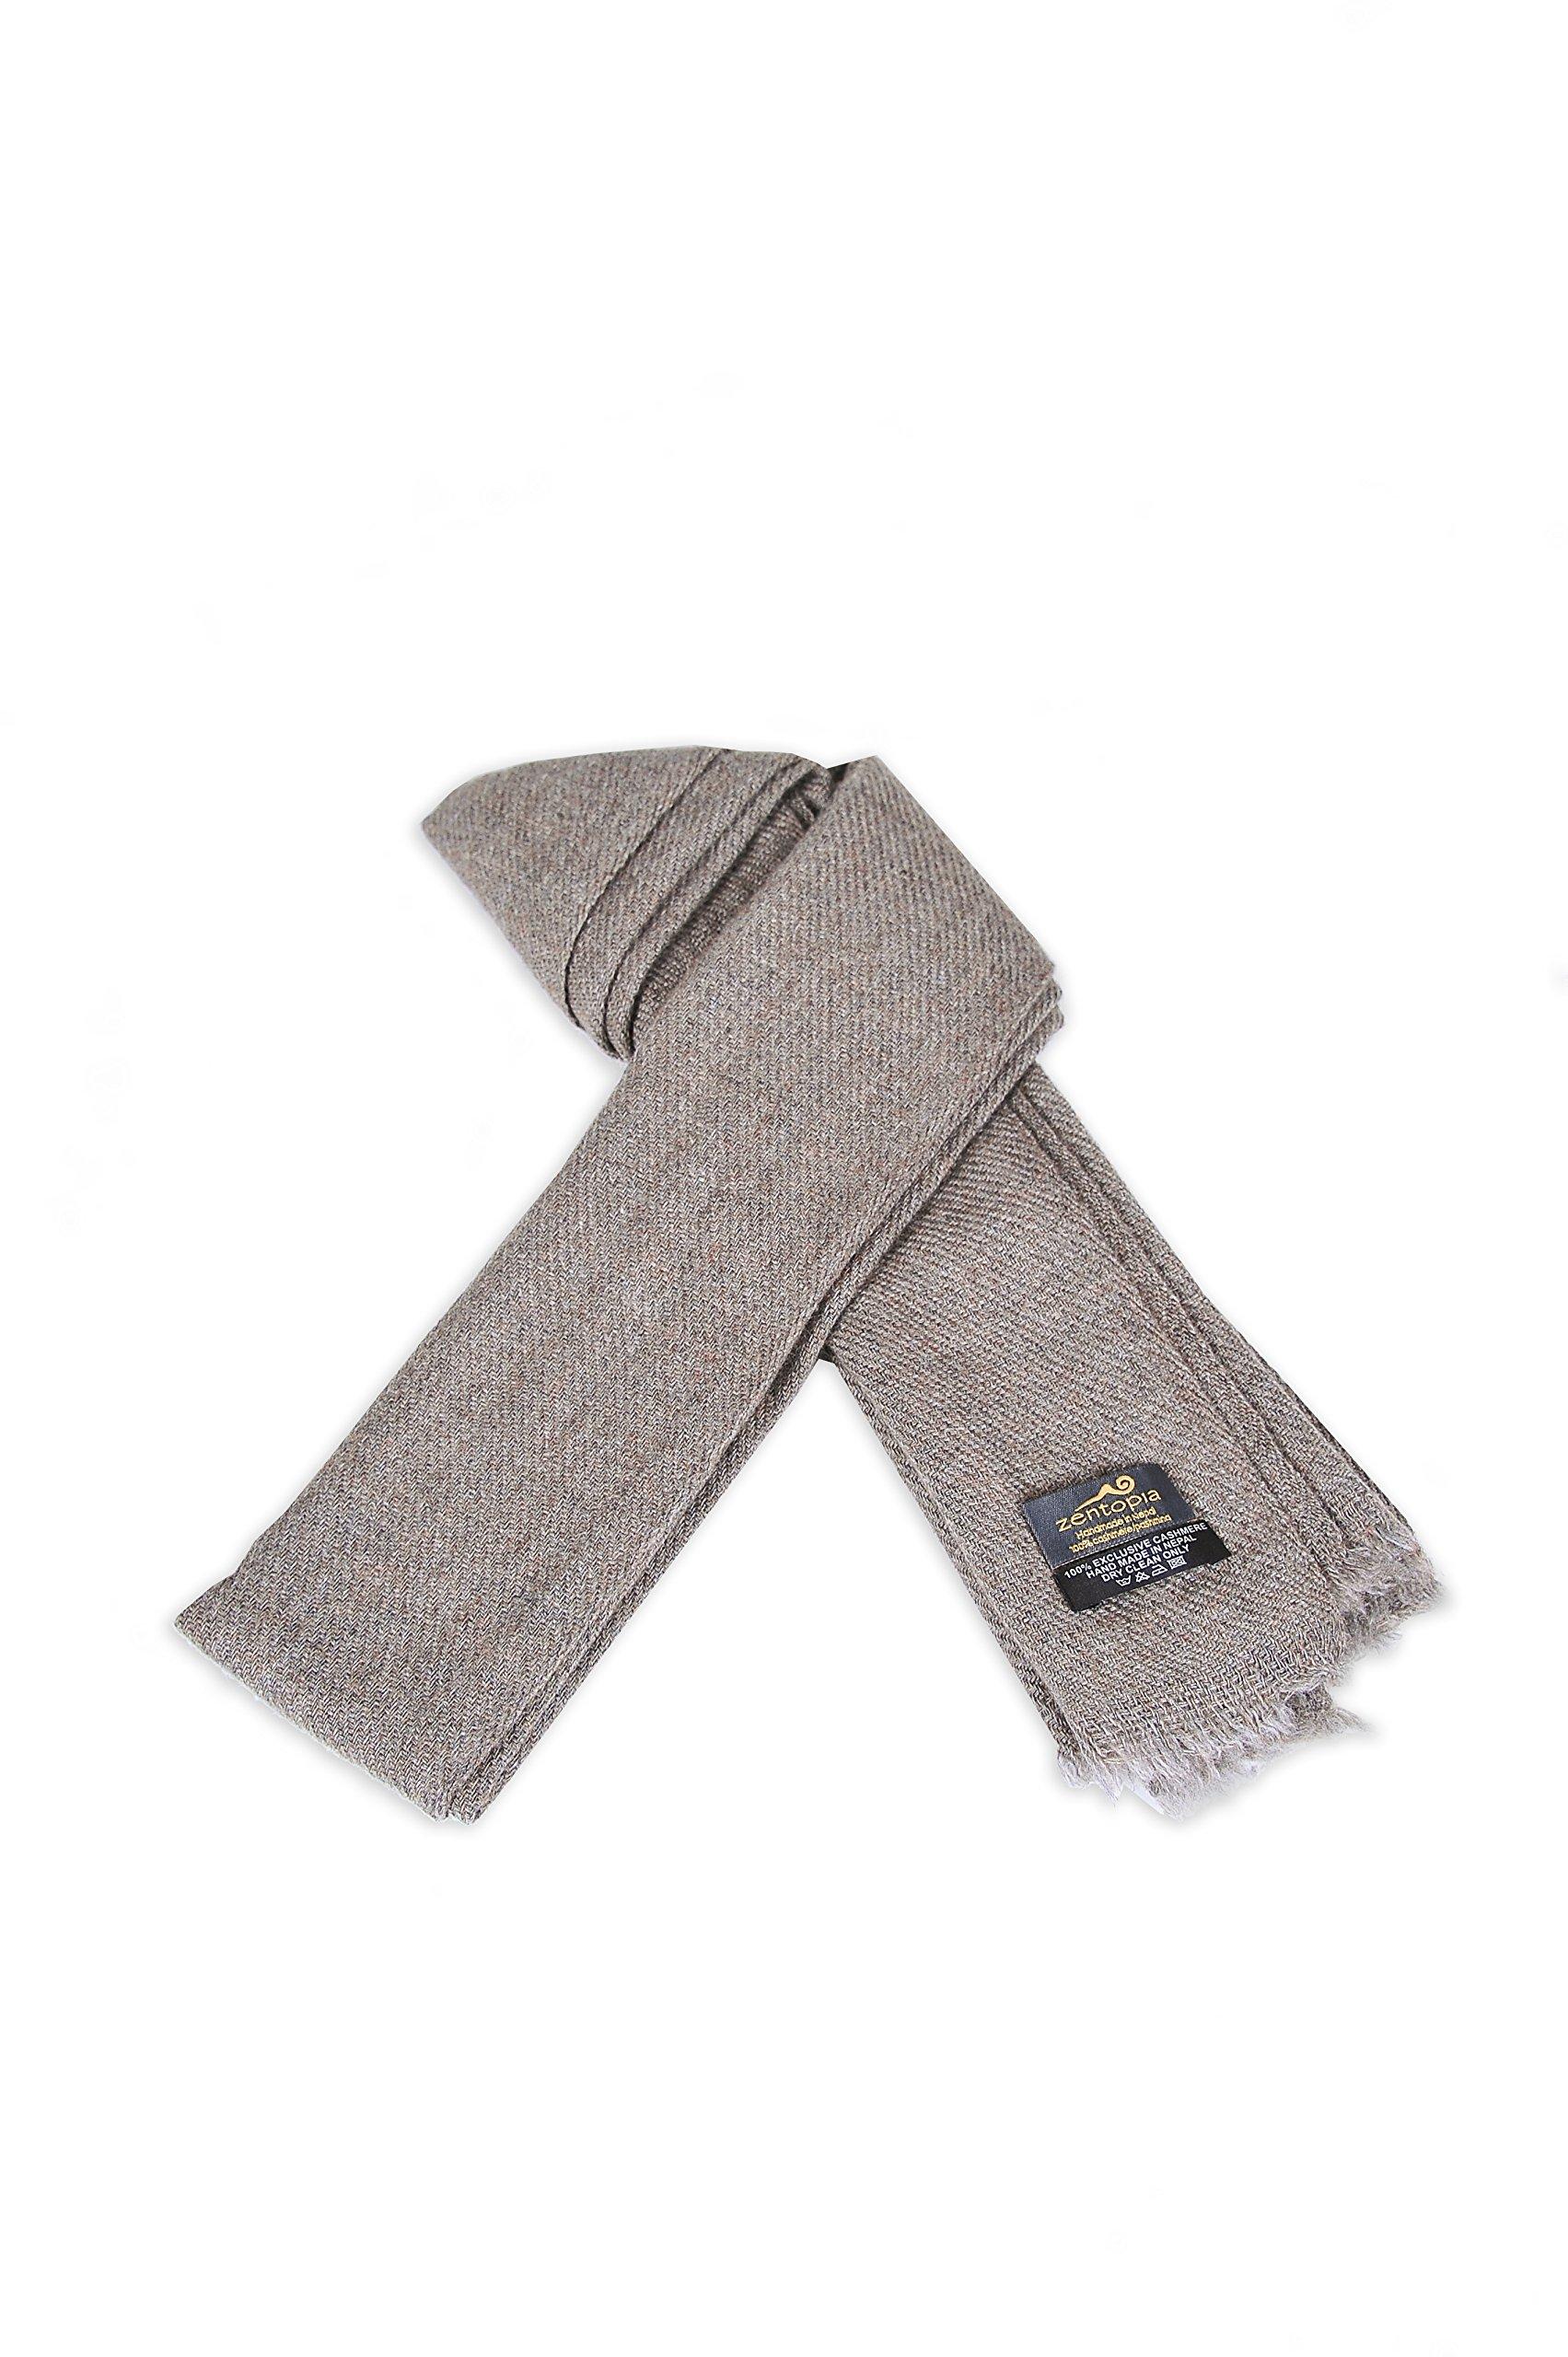 Zentopia classic 100% Grade A cashmere handmade scarf narrow cut light weight (Brown) by Zentopia